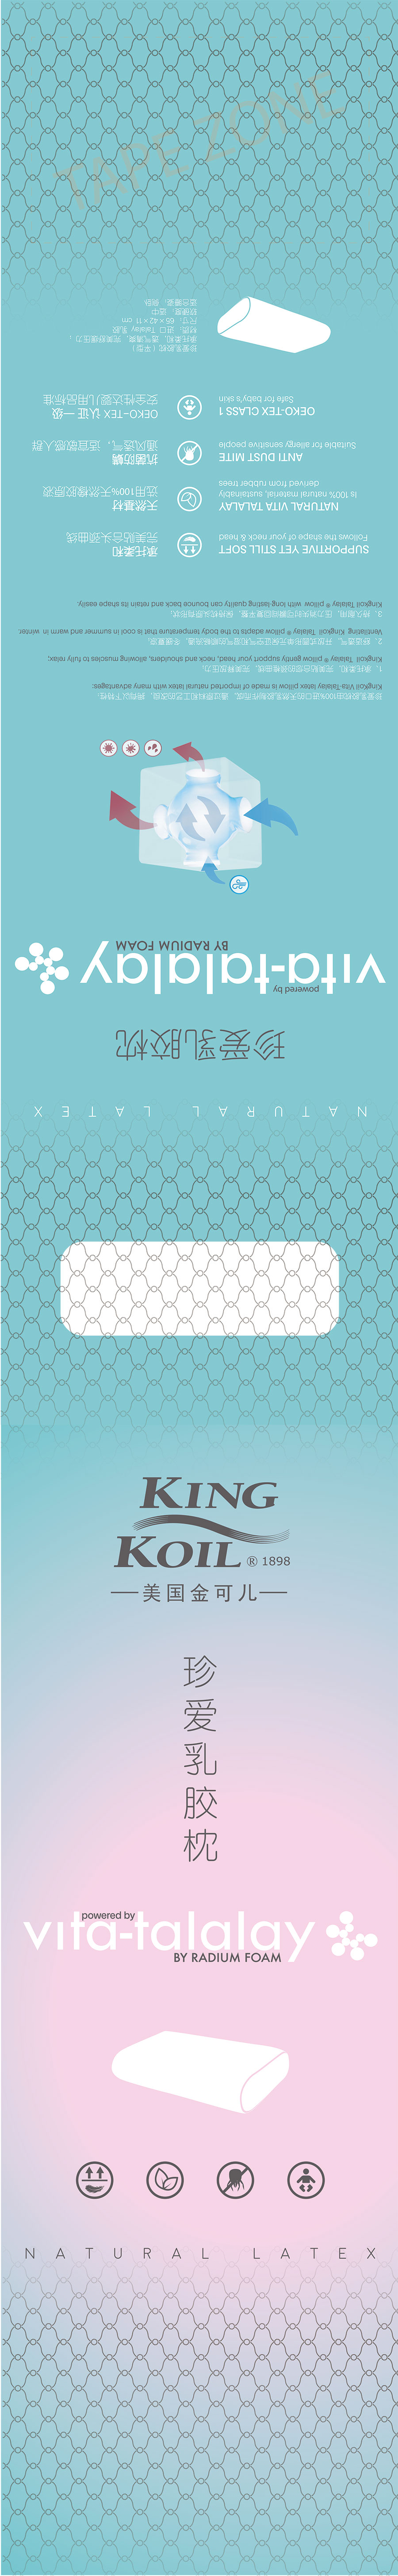 quentin_paquignon-packaging-kingkoilchina_09.jpg